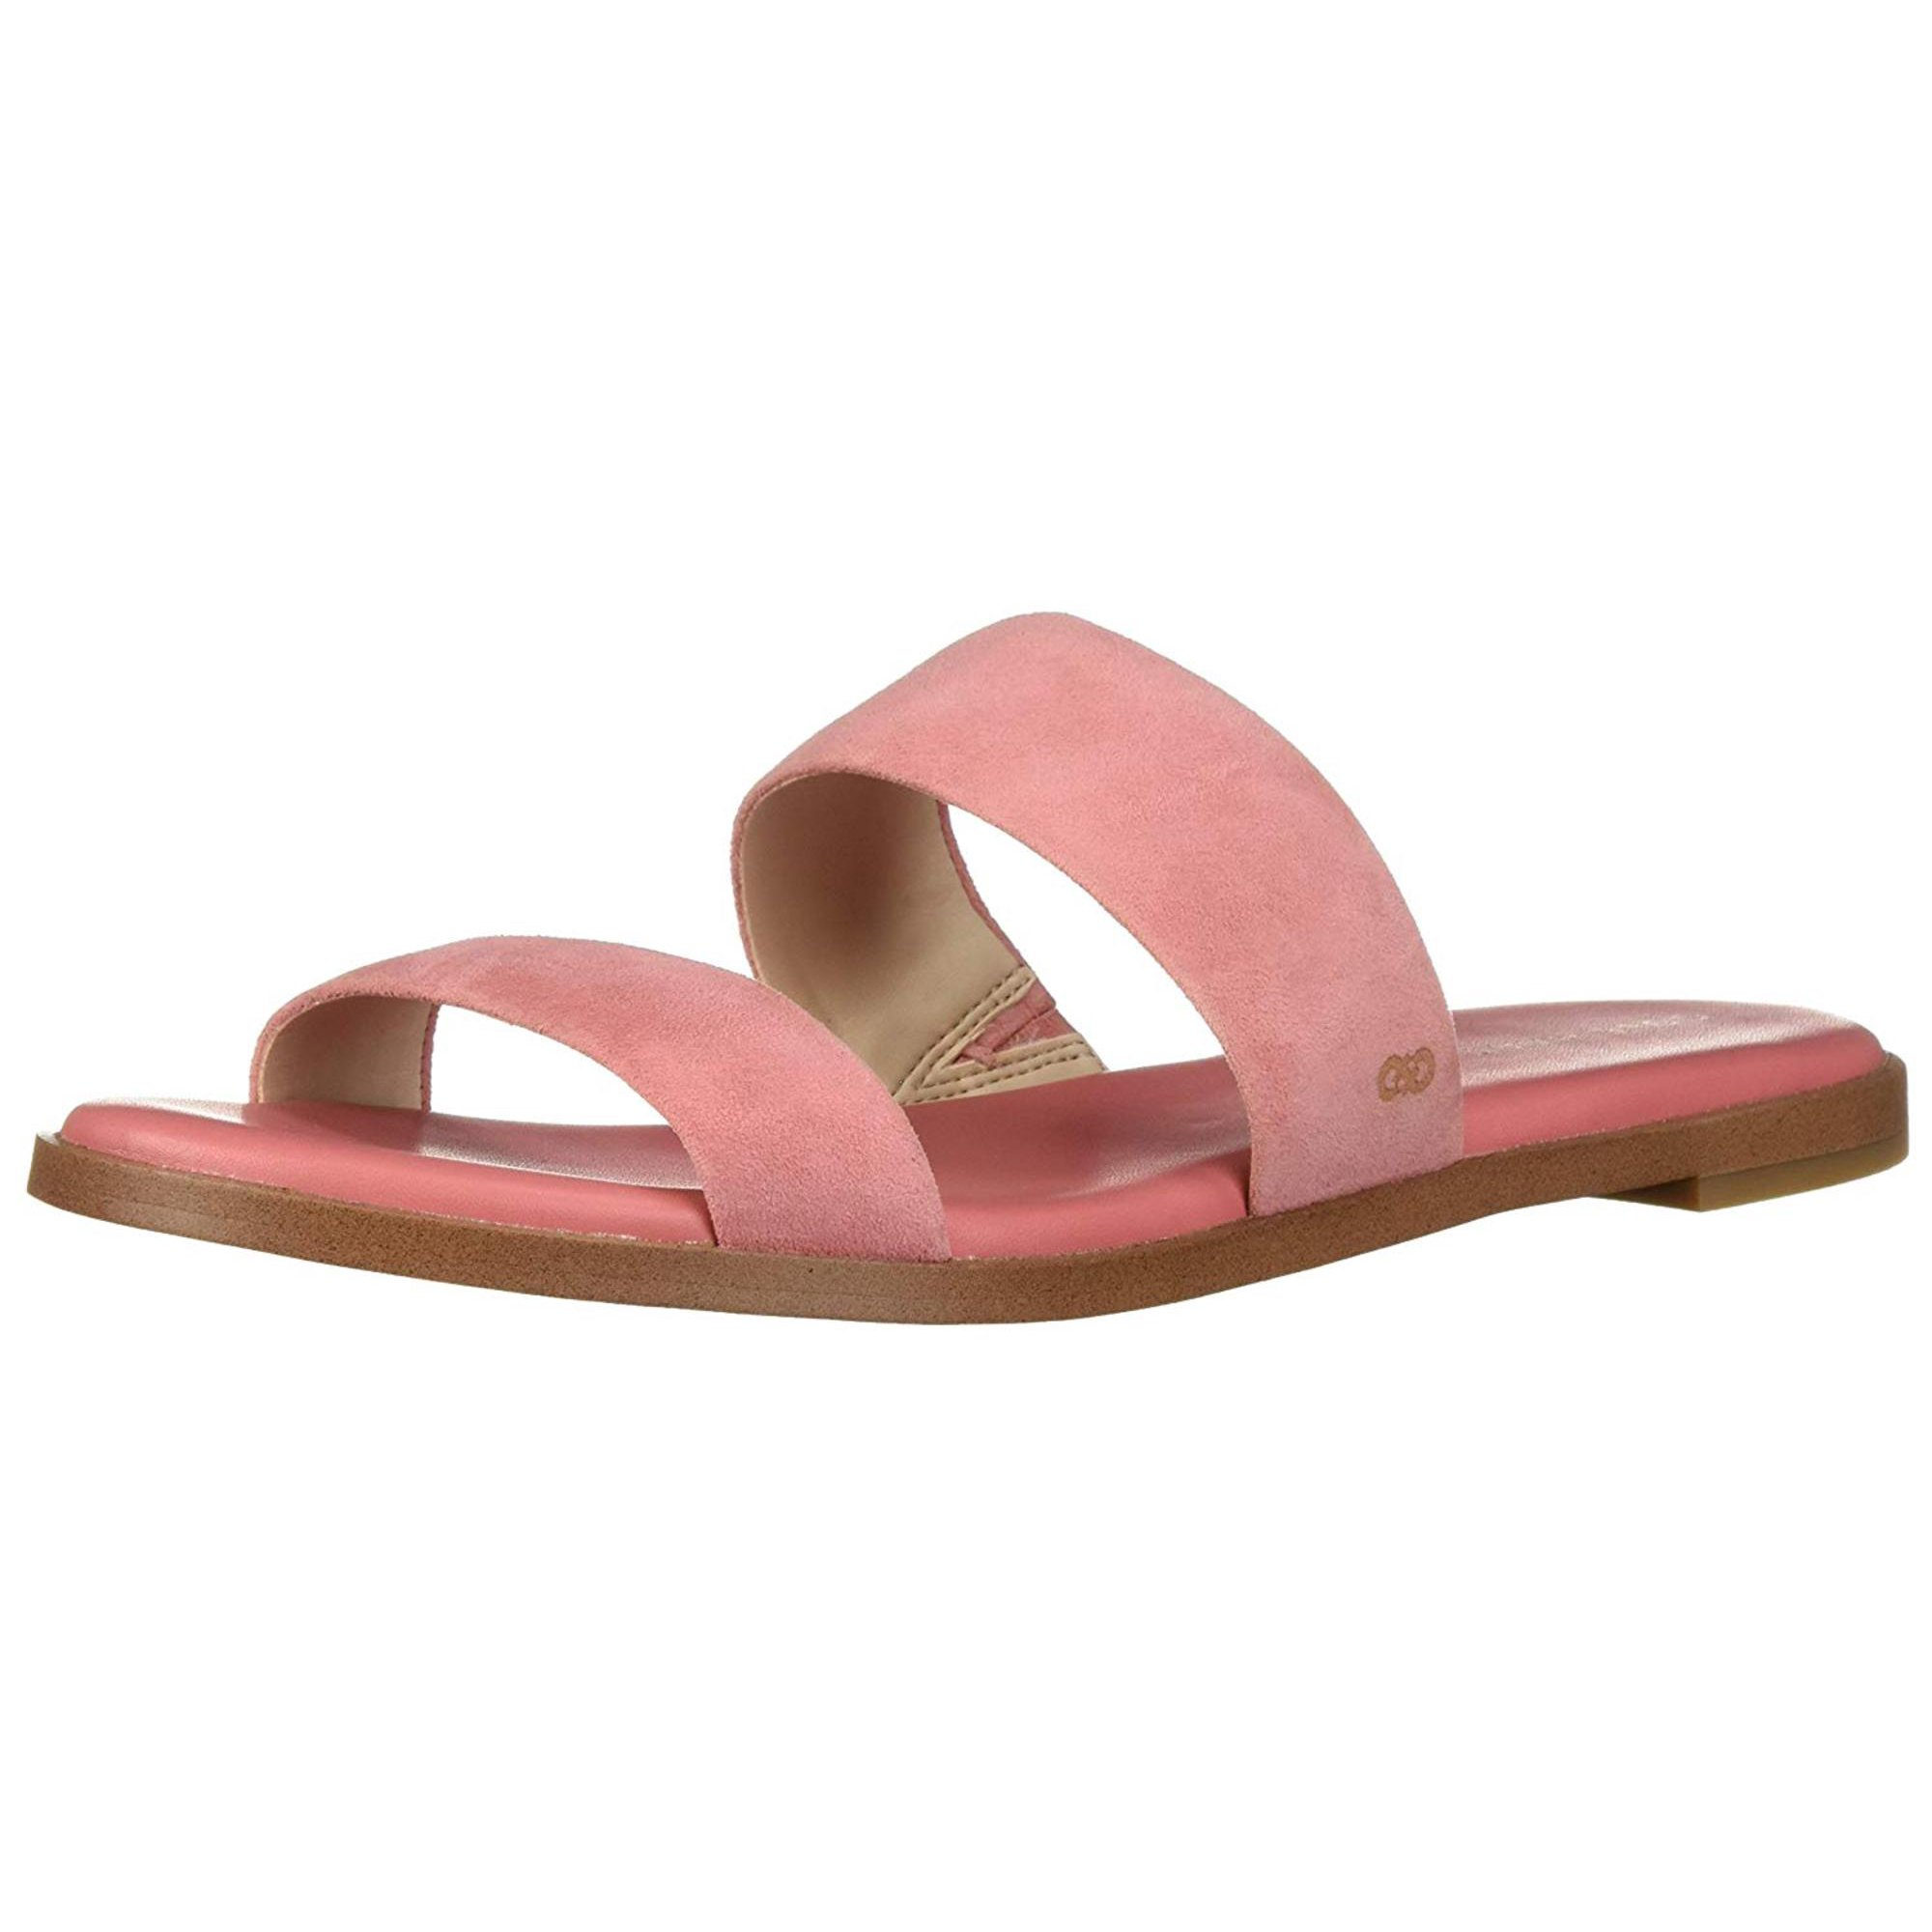 d6e14f10fd4 Cole Haan Women s FINDRA Sandal II Flat